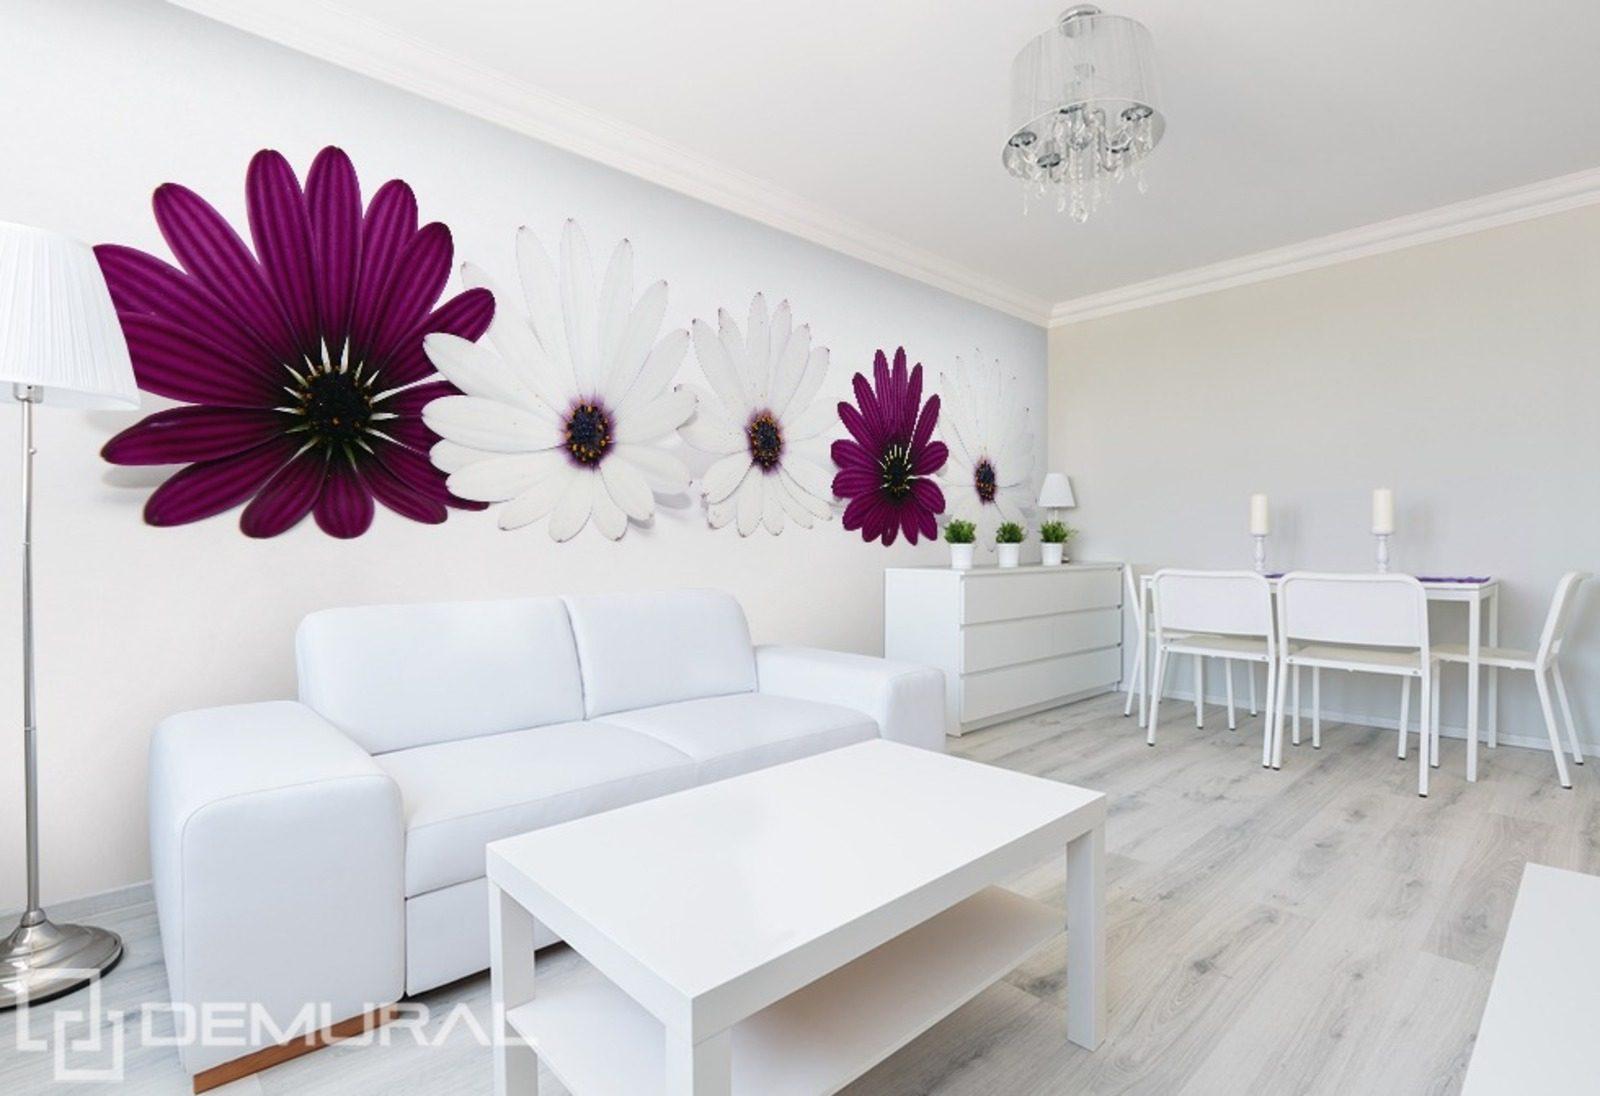 fototapete vlies astern tapeten fototapeten blumen fdb27. Black Bedroom Furniture Sets. Home Design Ideas